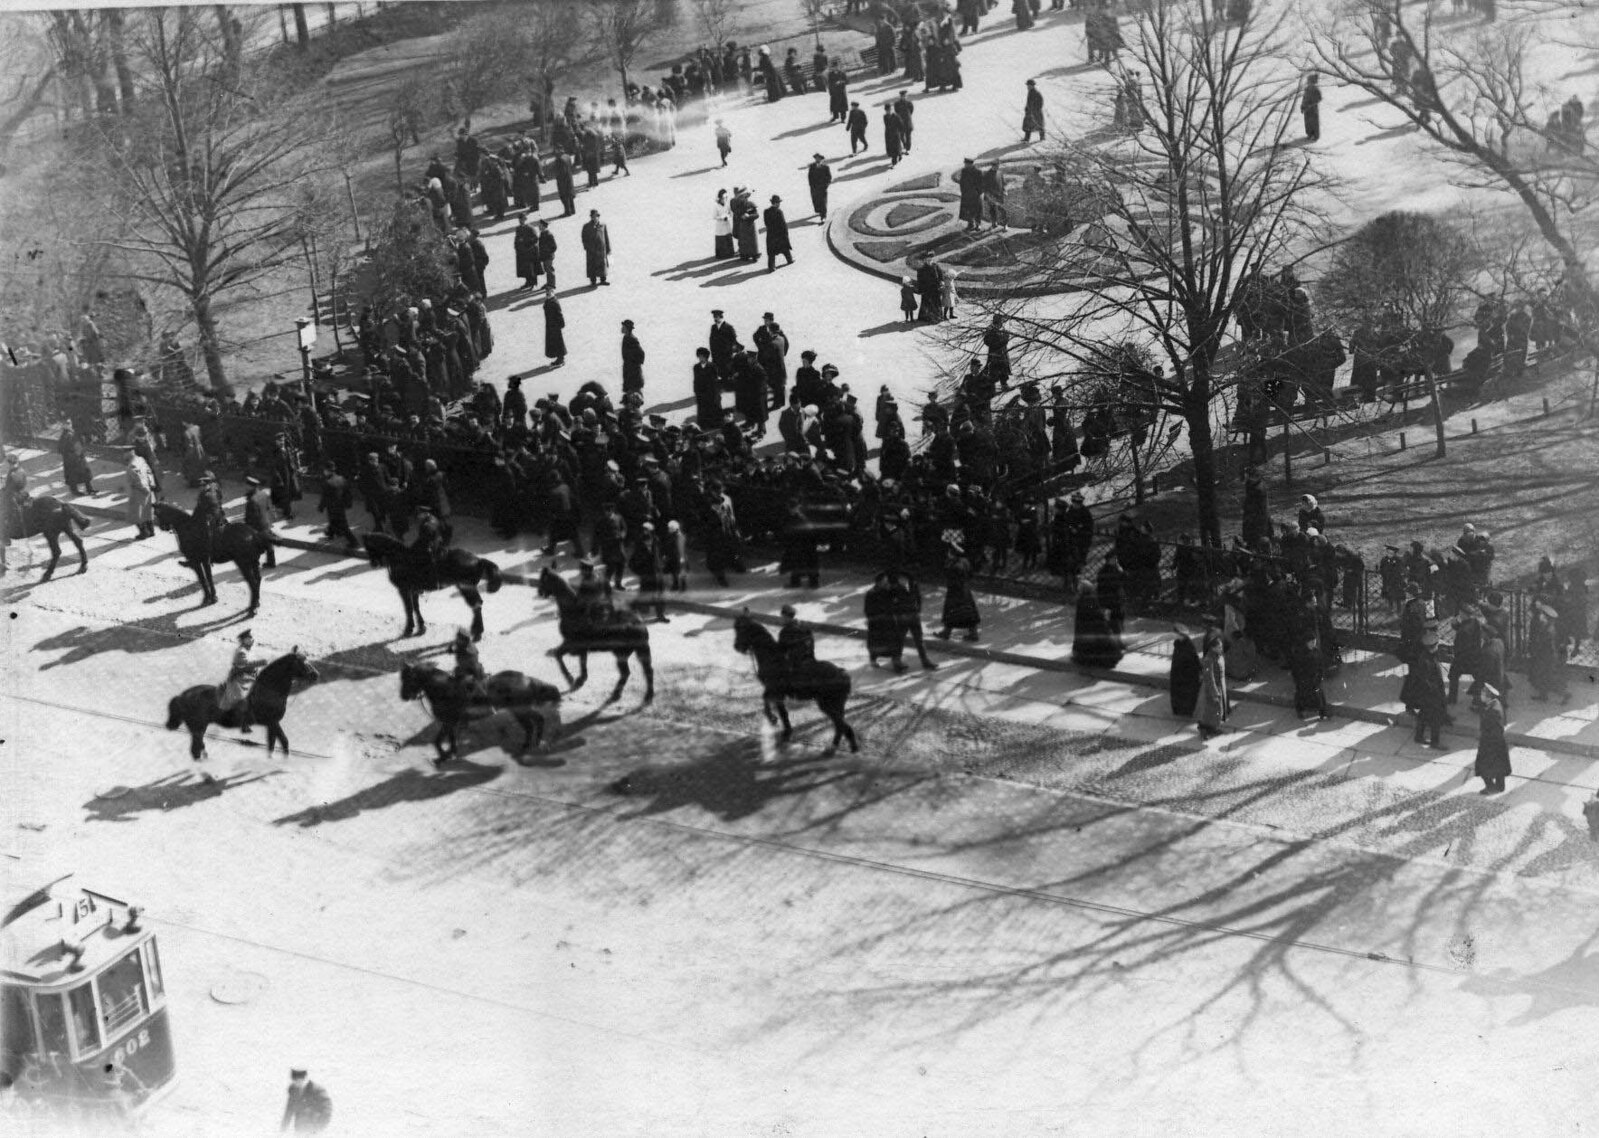 22. 1912. Разгон демонстрации протеста на Невском проспекте. Санкт-Петербург. 15 апреля